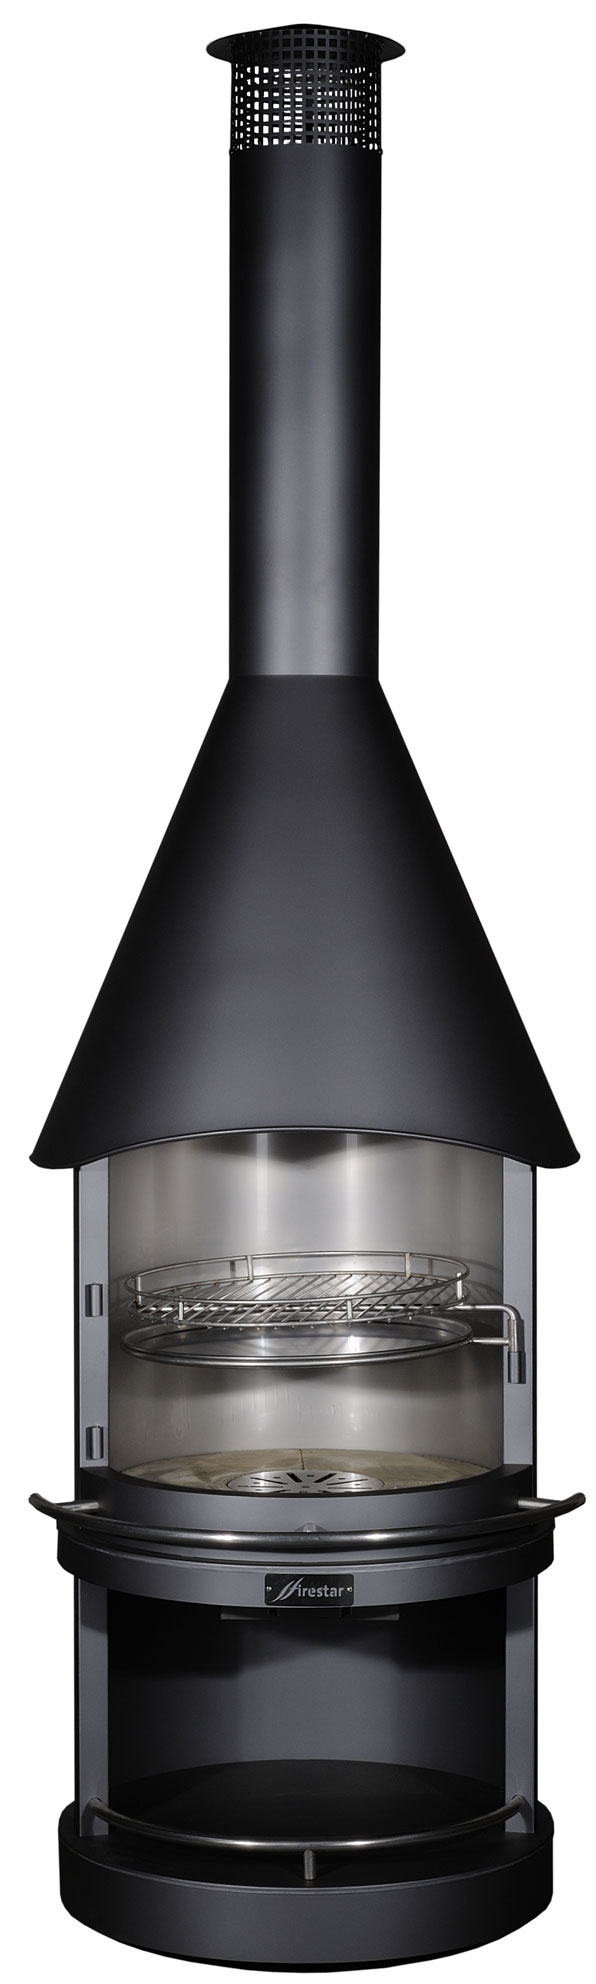 gartenkamin grillkamin firestar edelstahl classic schwarz dn 800 bei. Black Bedroom Furniture Sets. Home Design Ideas